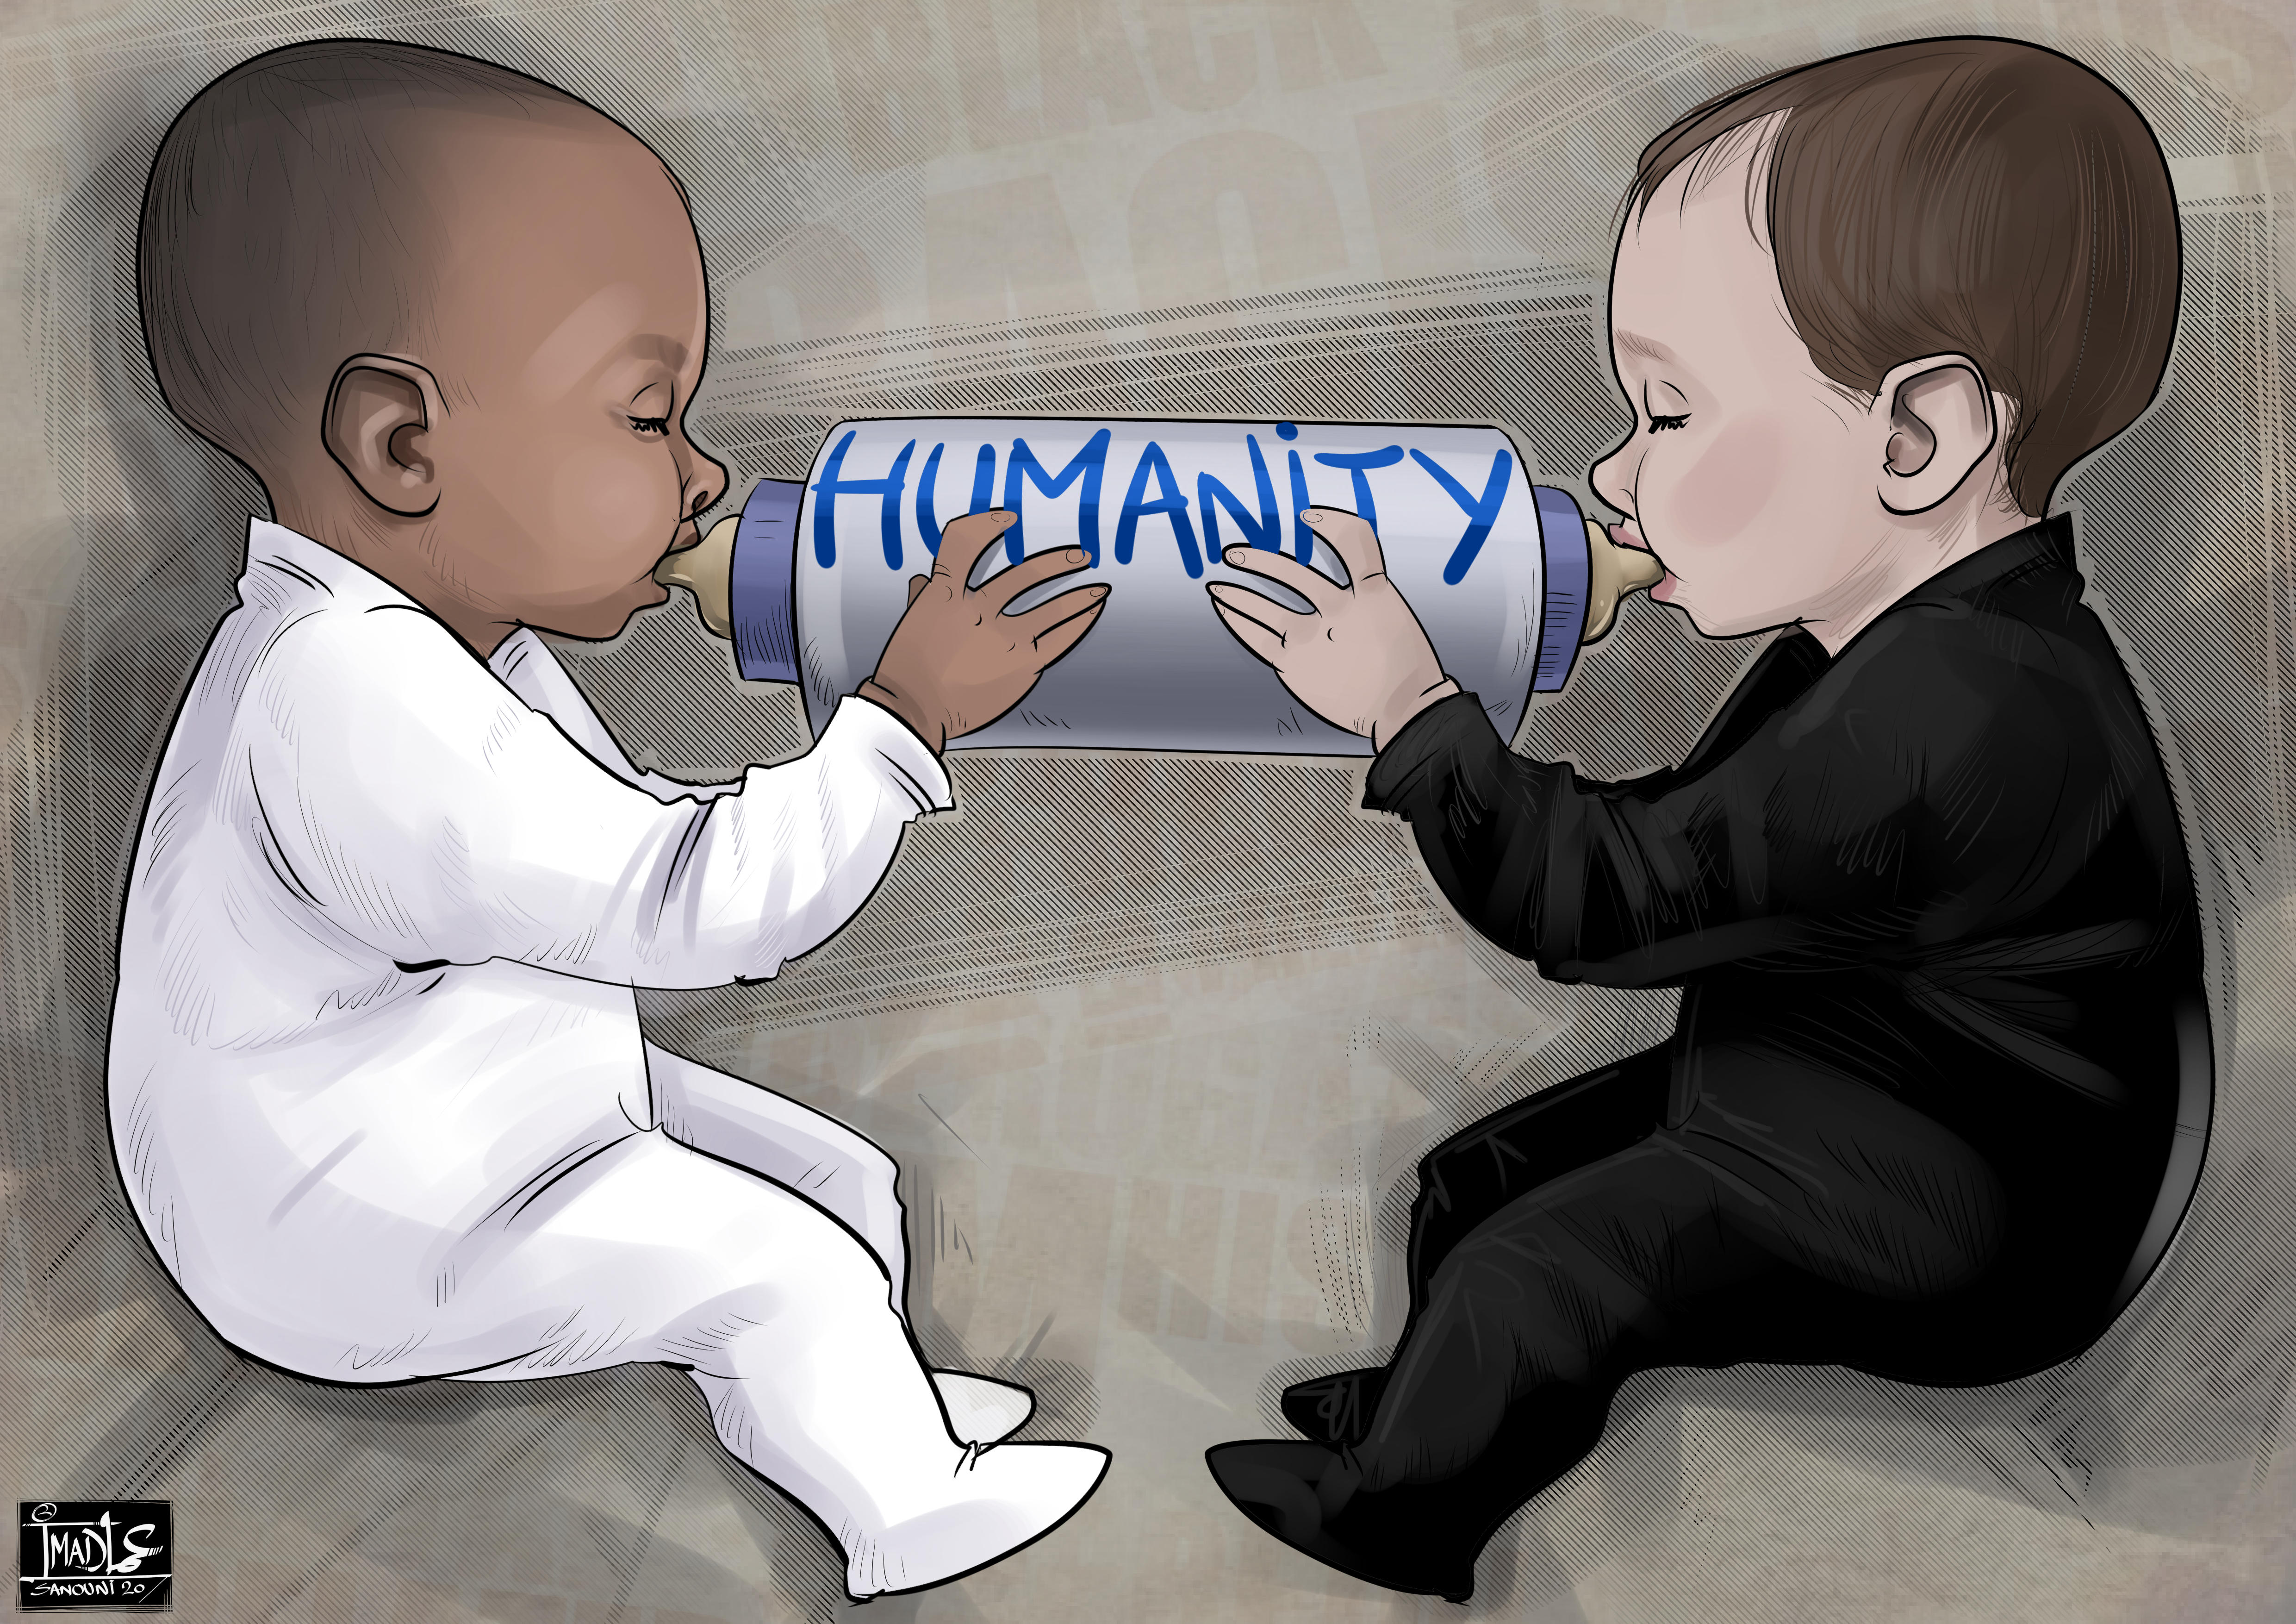 on naît humain racisme